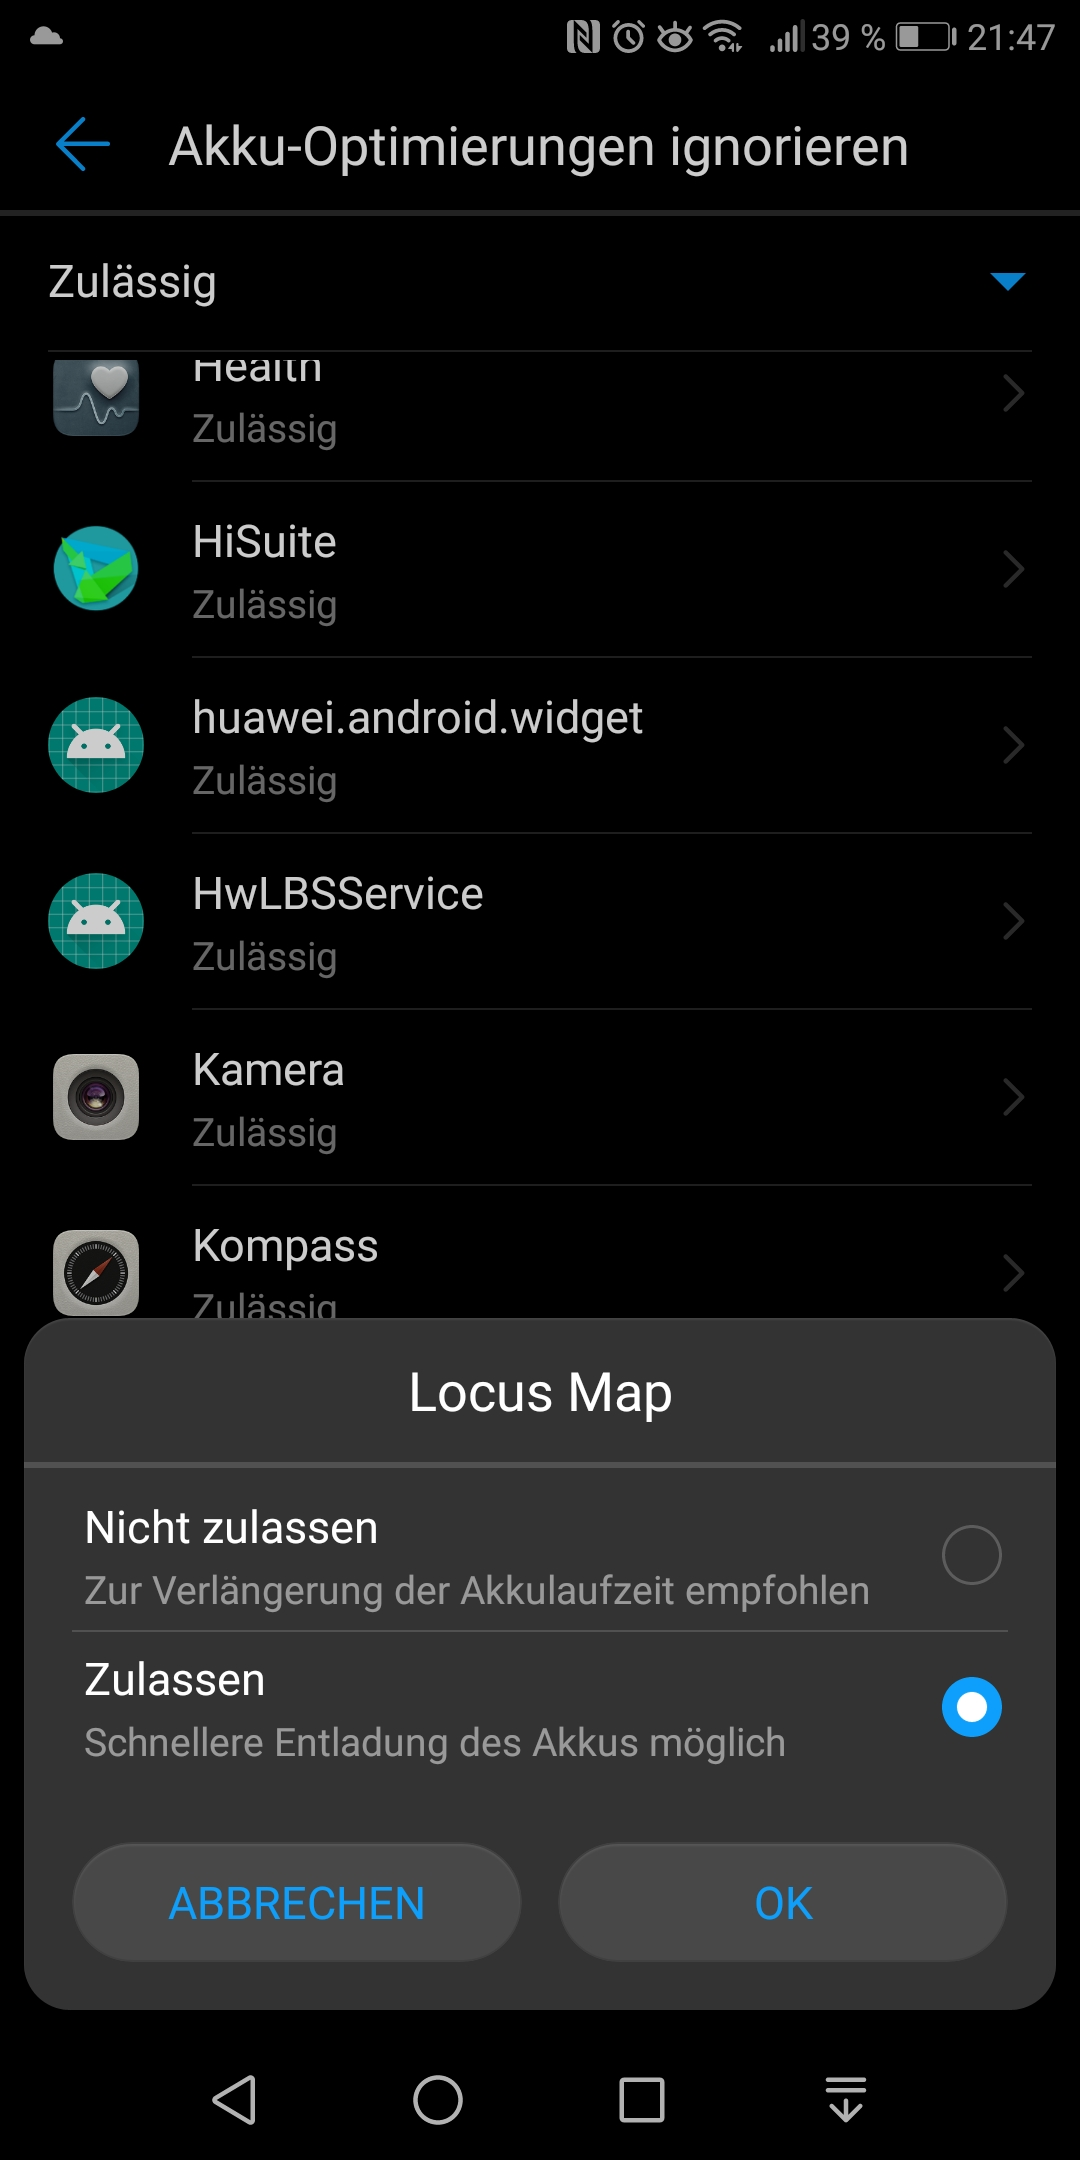 Locus Map terminated on Huawei smartphones